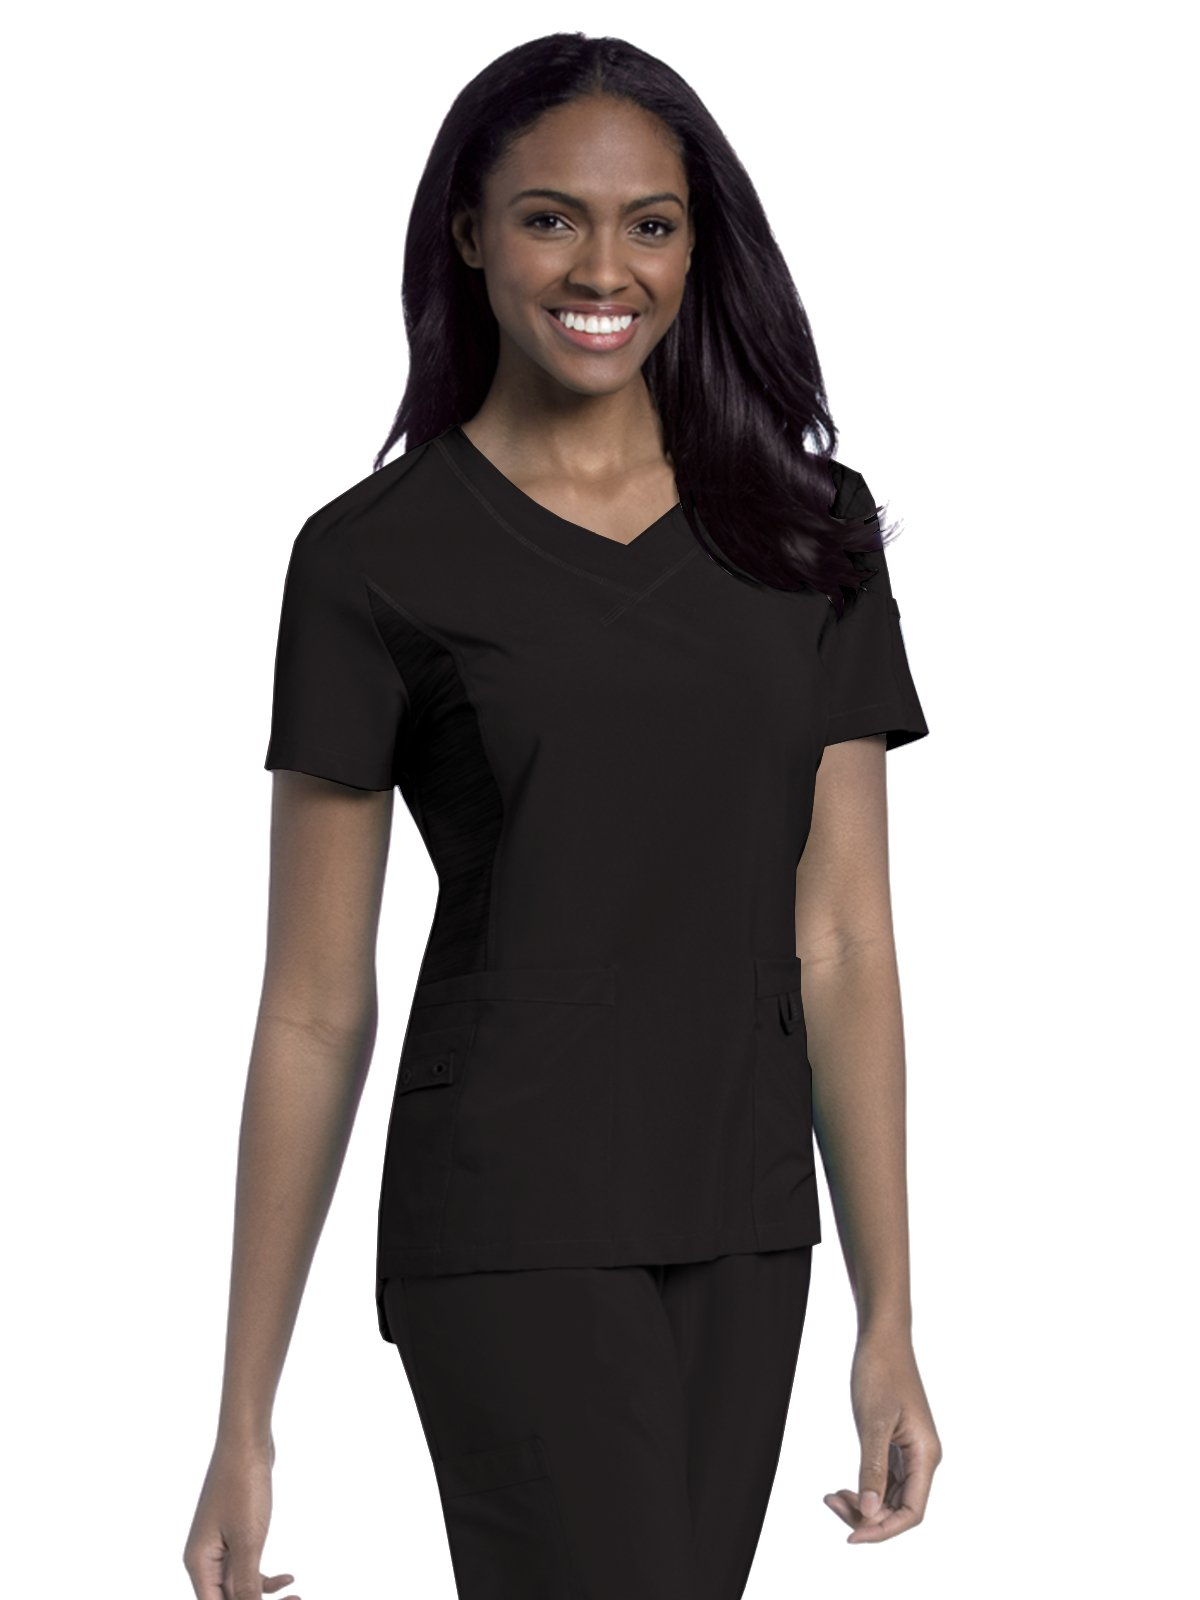 Urbane Performance 9047 Women's Modern Fit Quick Cool Sport Scrub Tunic Black S